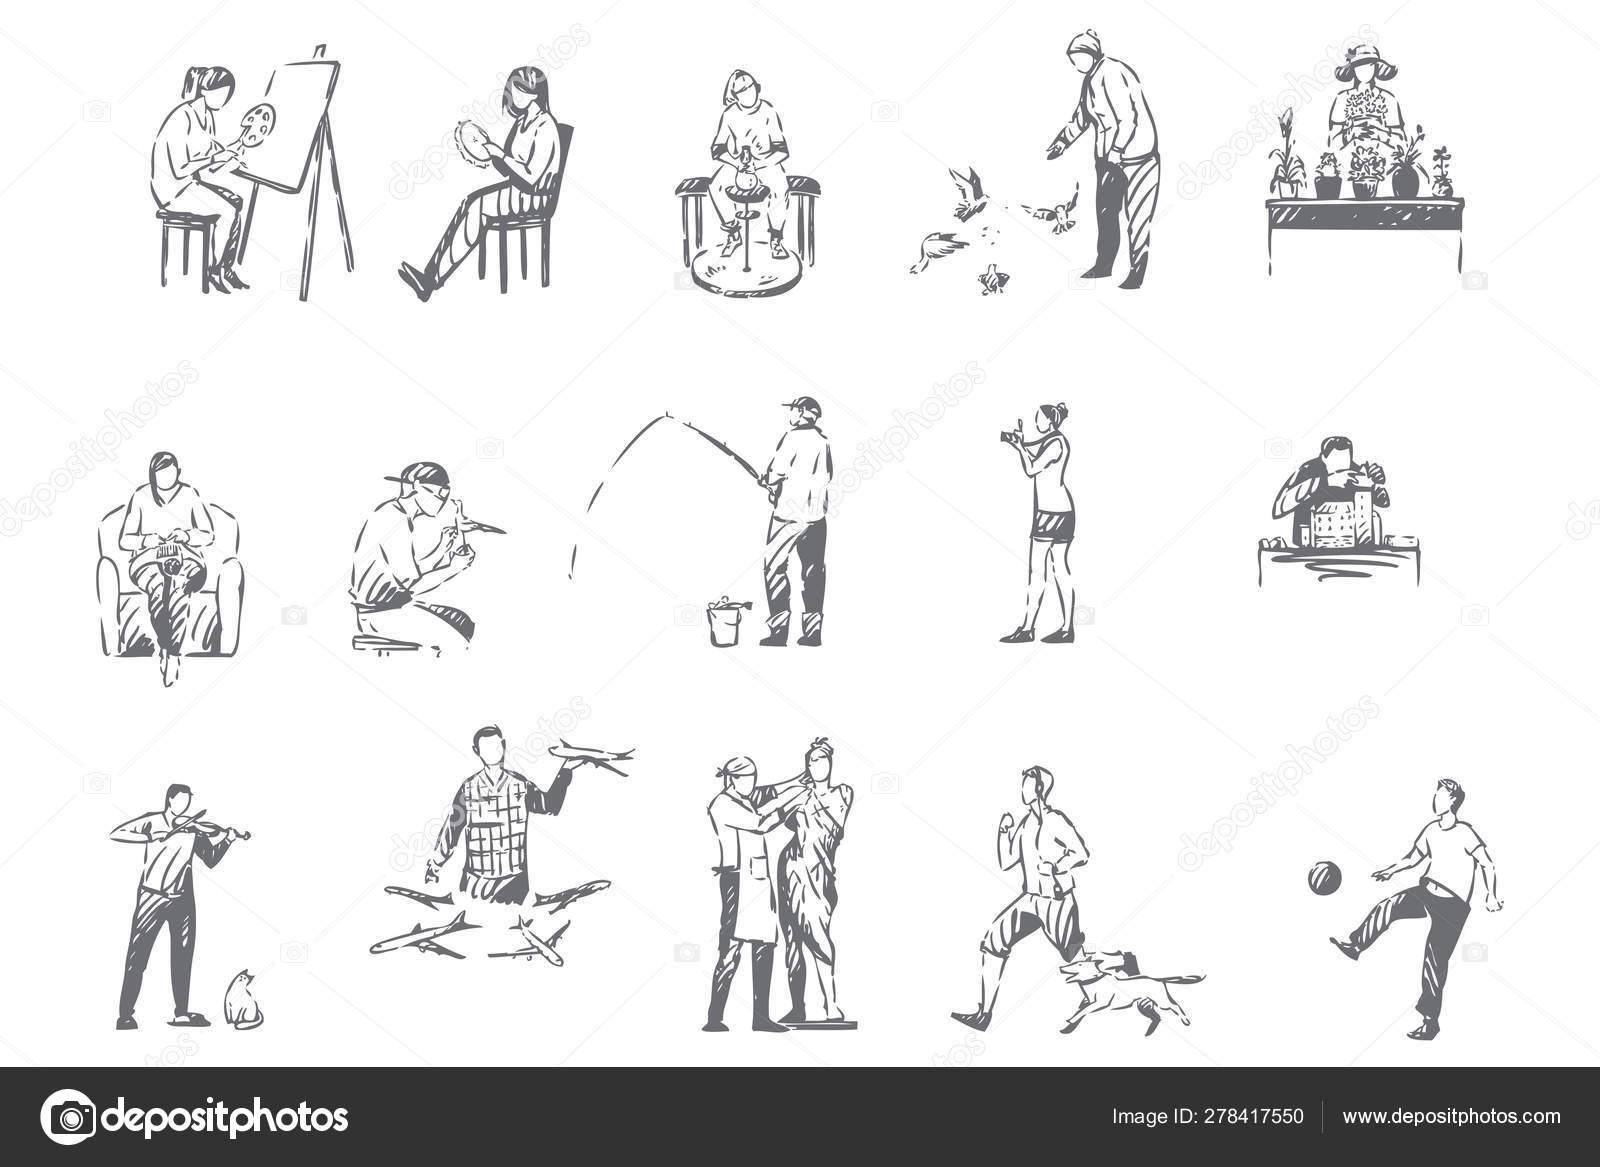 140,215 Hobbies Illustrations, Royalty-Free Vector Graphics & Clip Art -  iStock